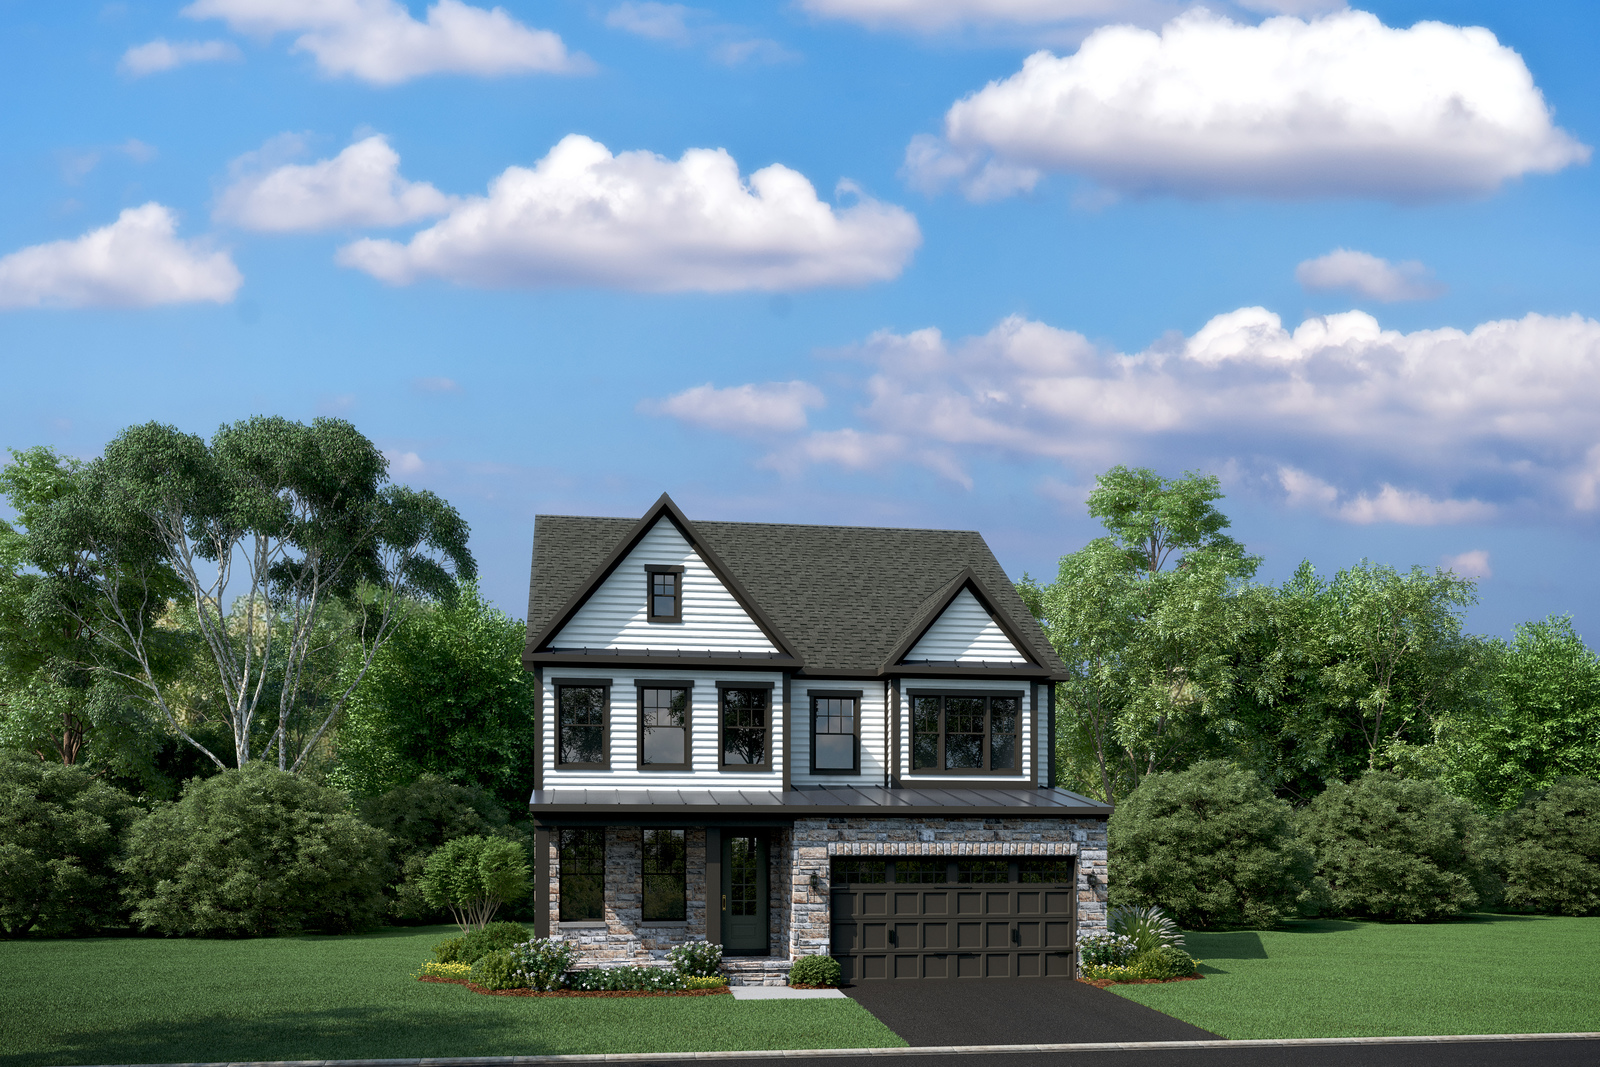 New baldwin home model for sale heartland homes for Heartland homes pittsburgh floor plans